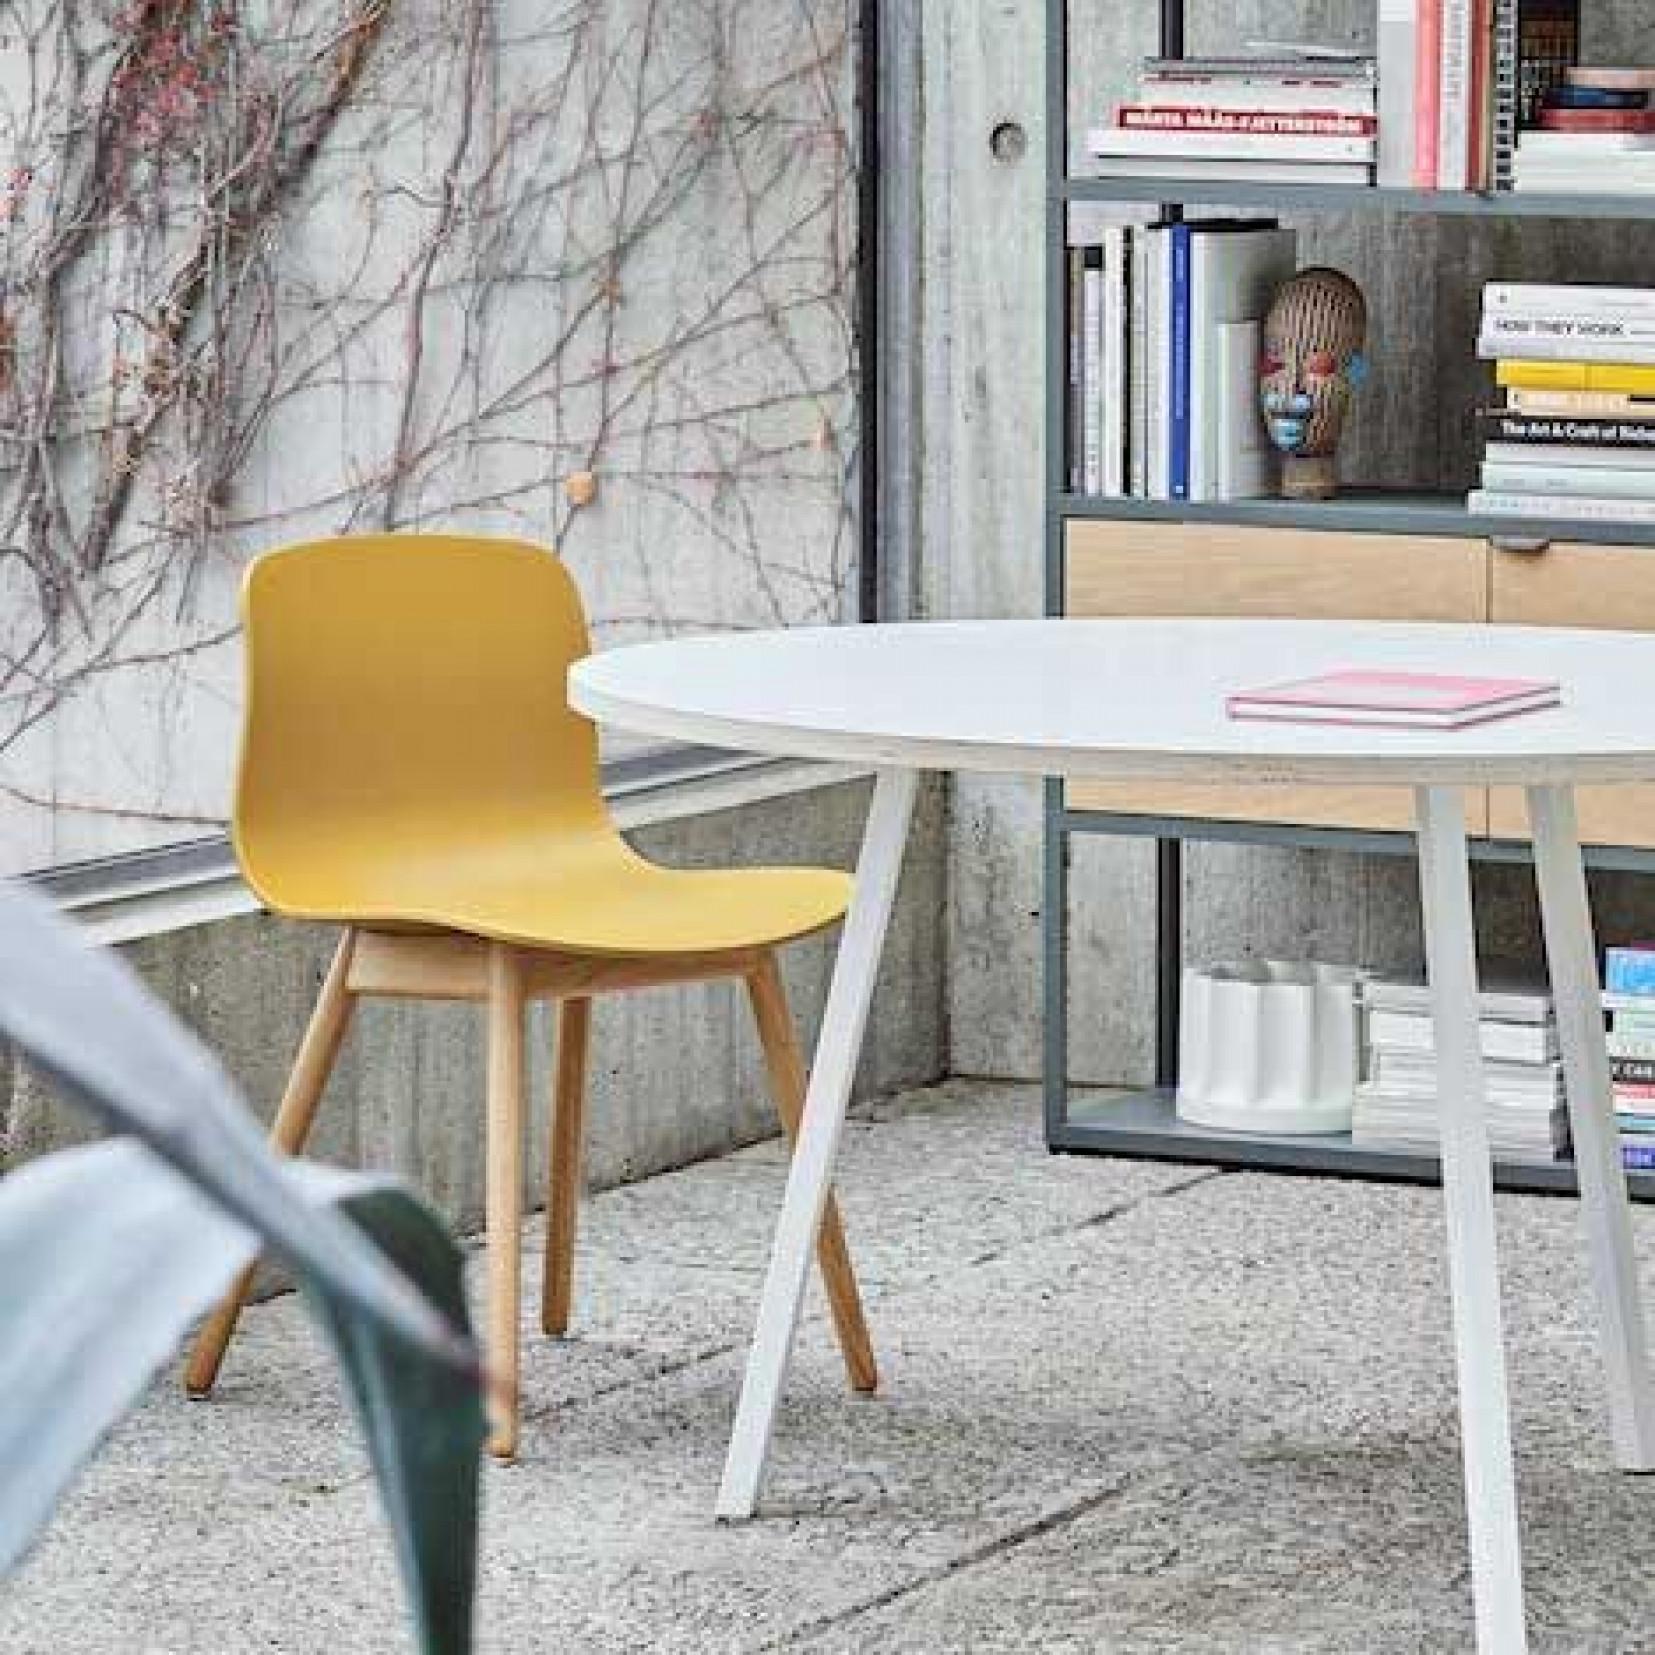 About A Chair AAC20 | Chêne Massif Savonné & Gris